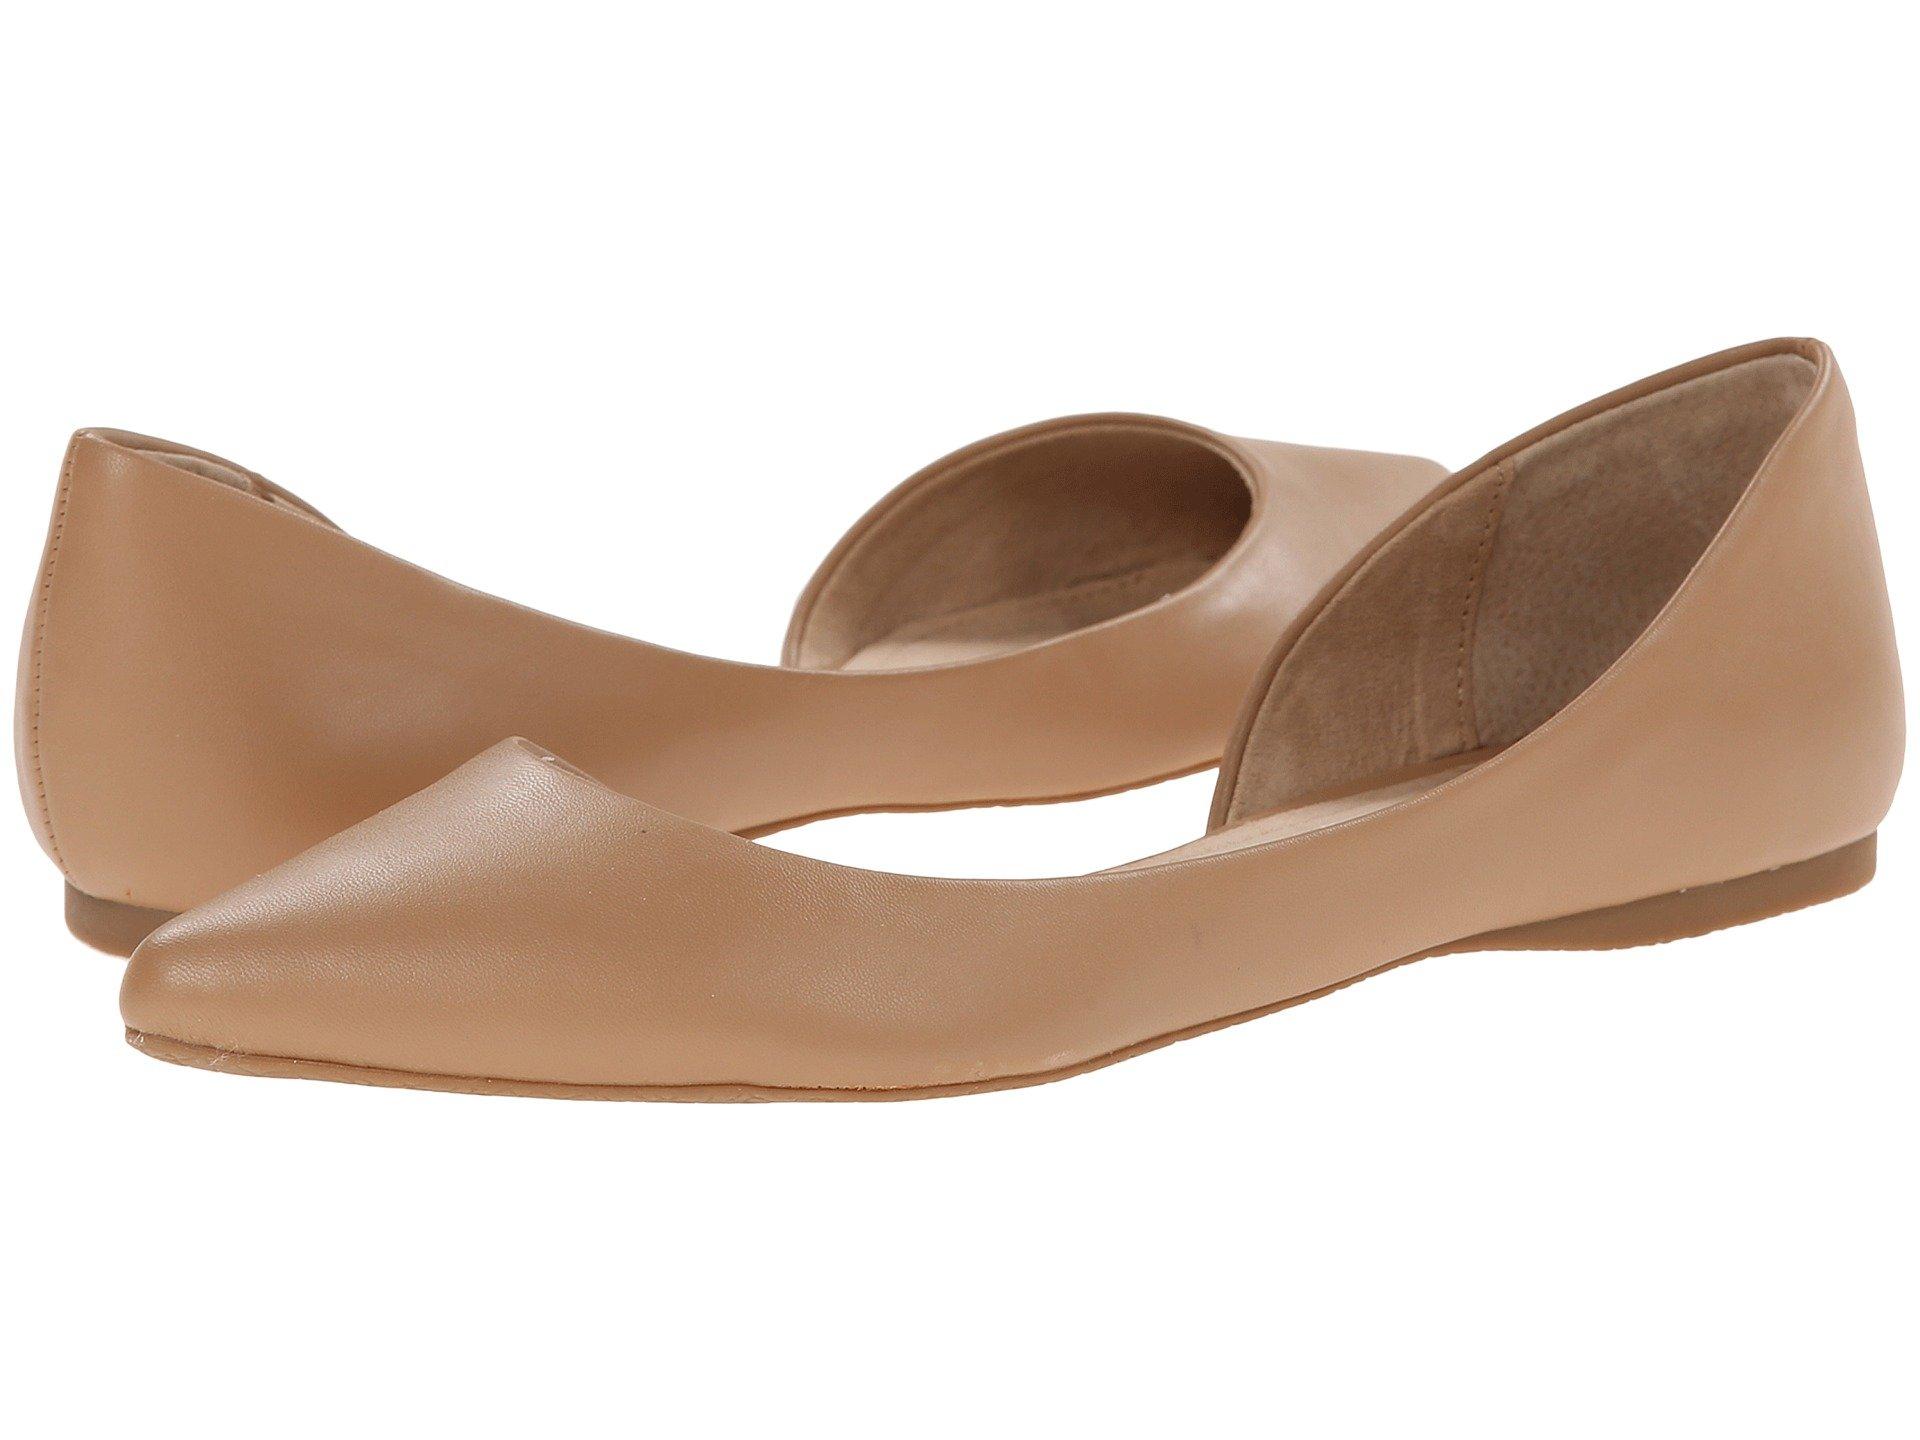 Baletas para Mujer Steve Madden Elusion  + Steve Madden en VeoyCompro.net